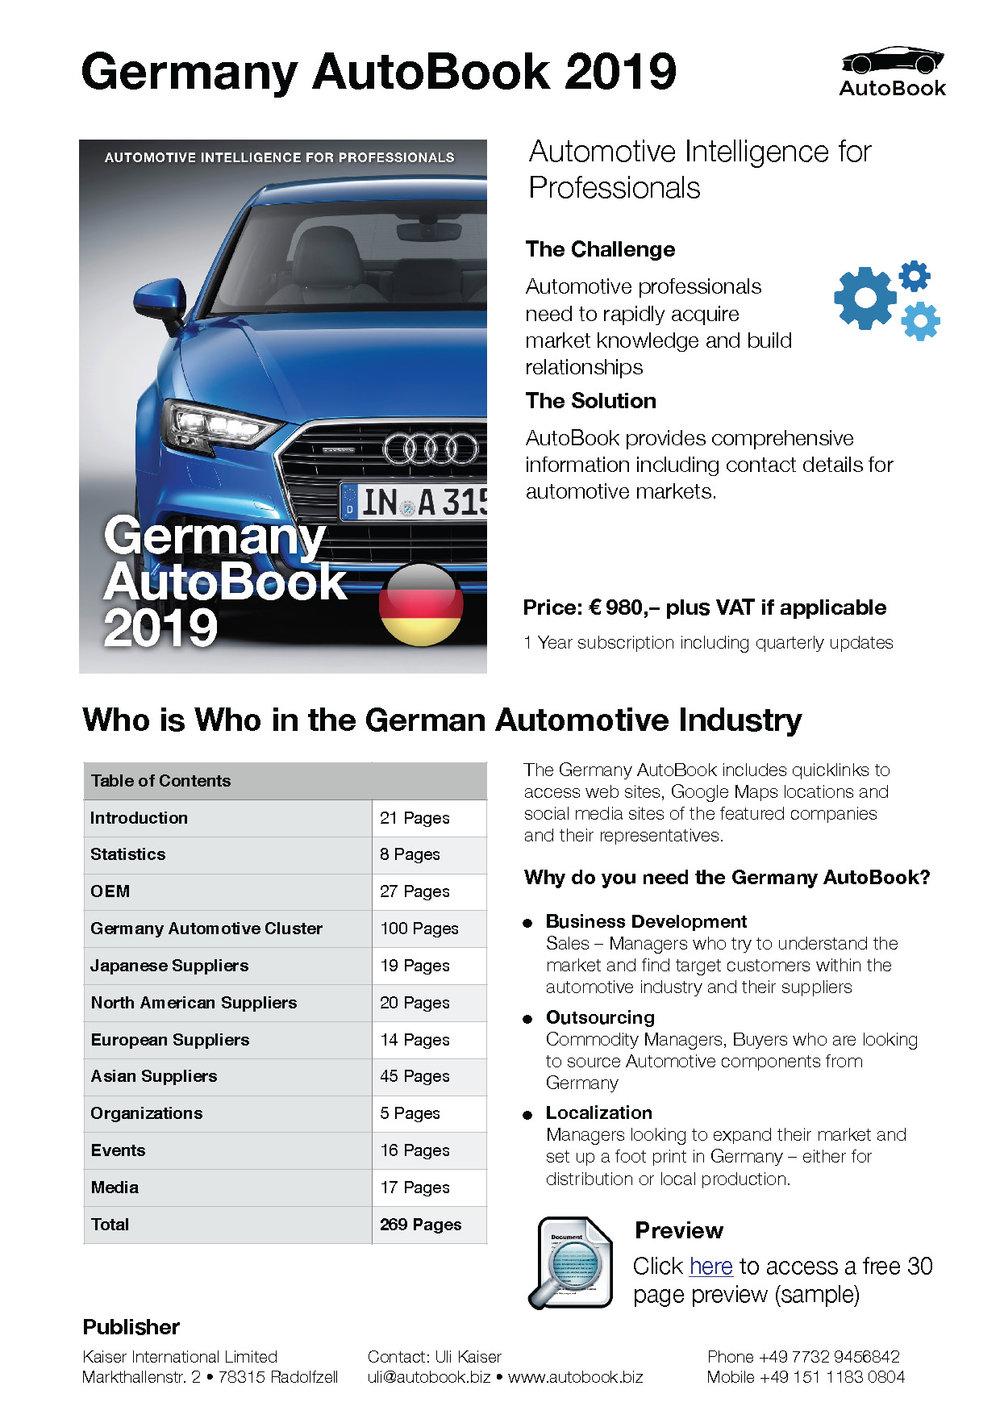 Germany AutoBook 2019 Datasheet.jpg